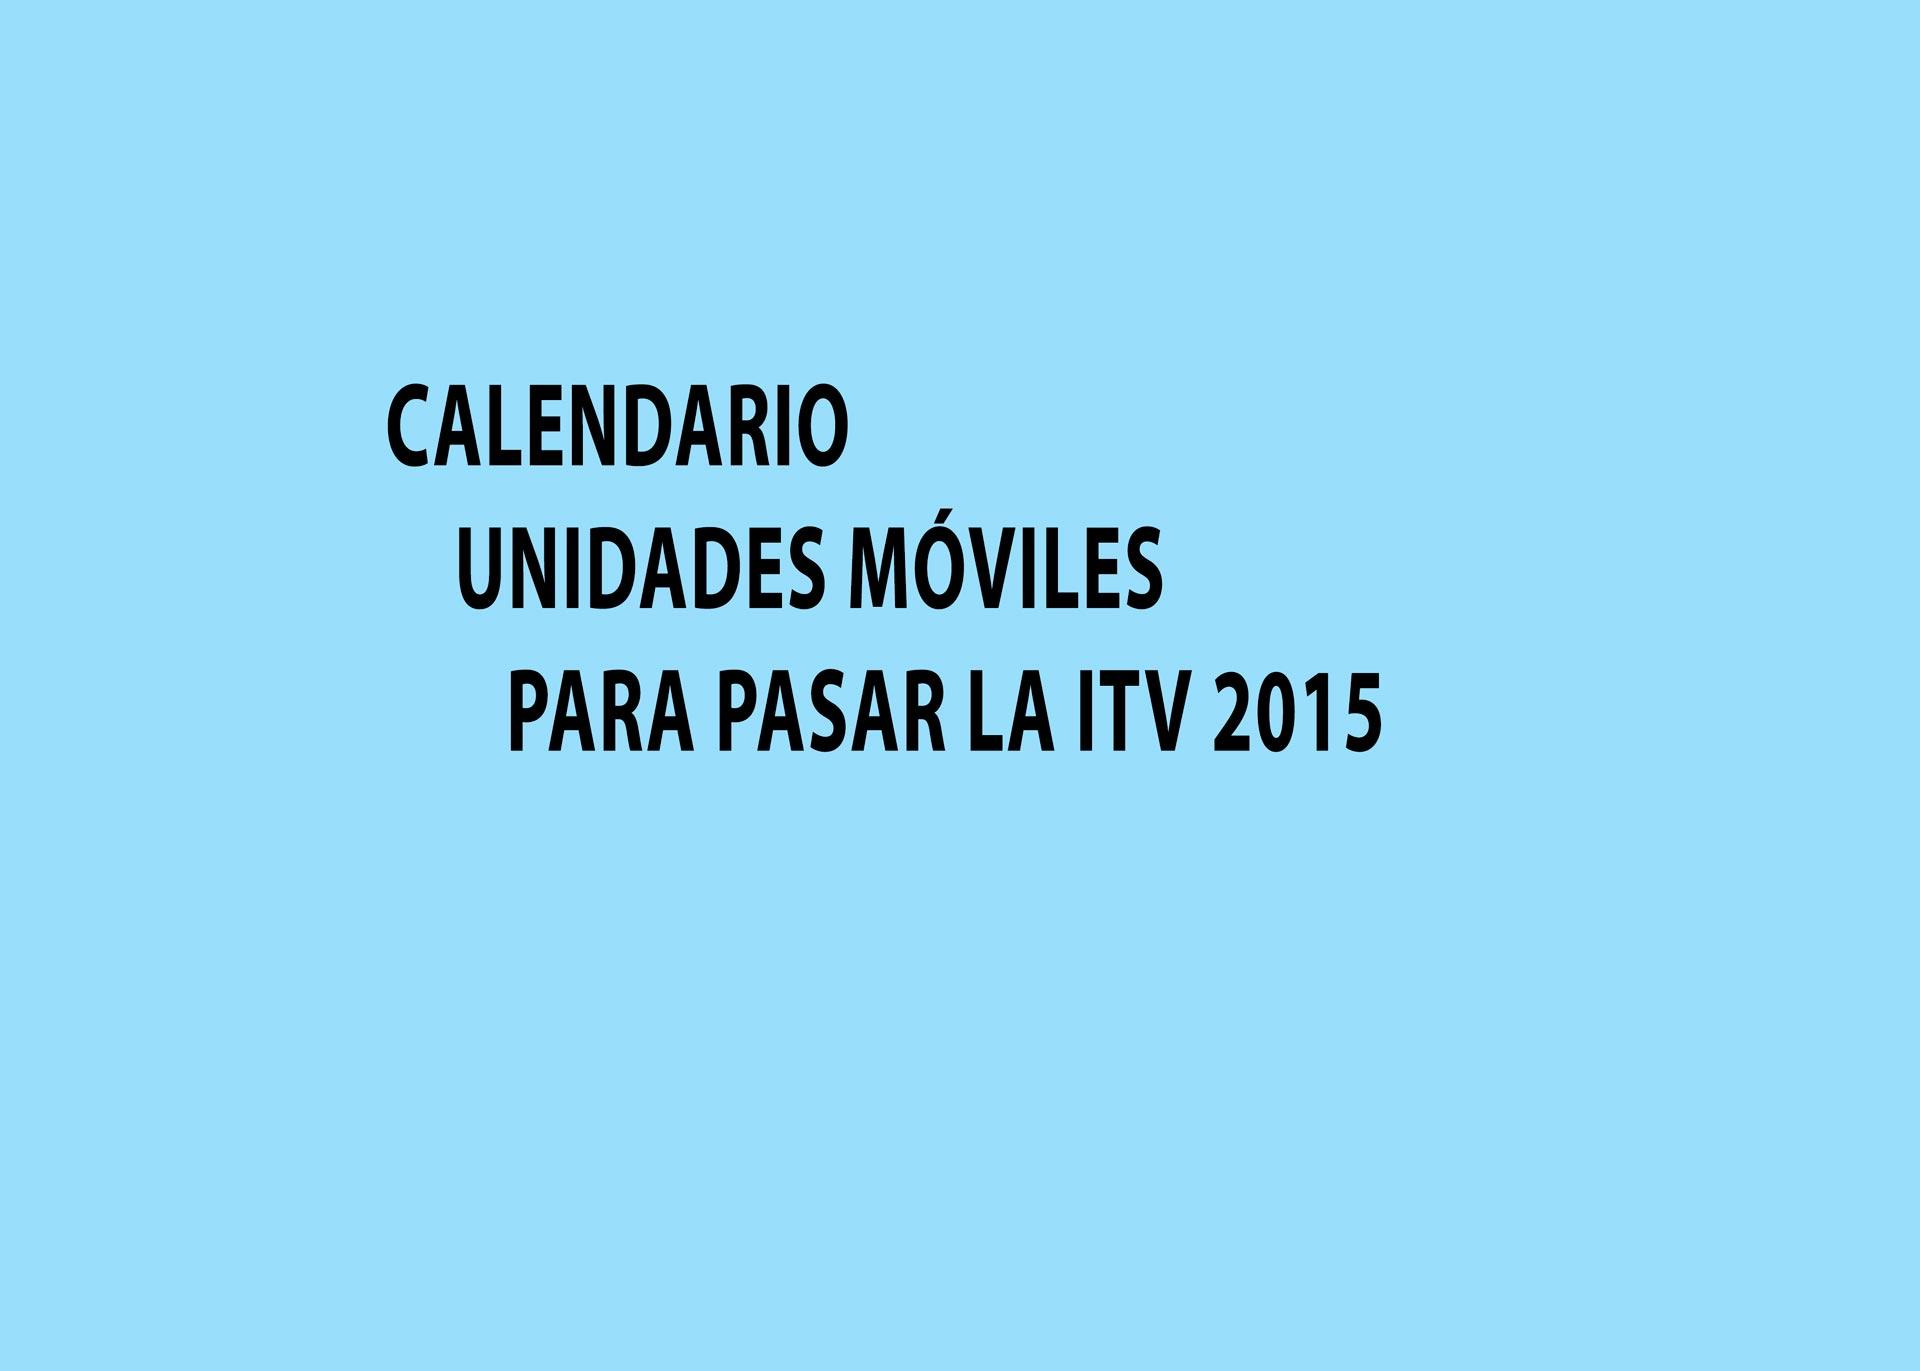 Calendario Unidades Móviles de ITV para 2015